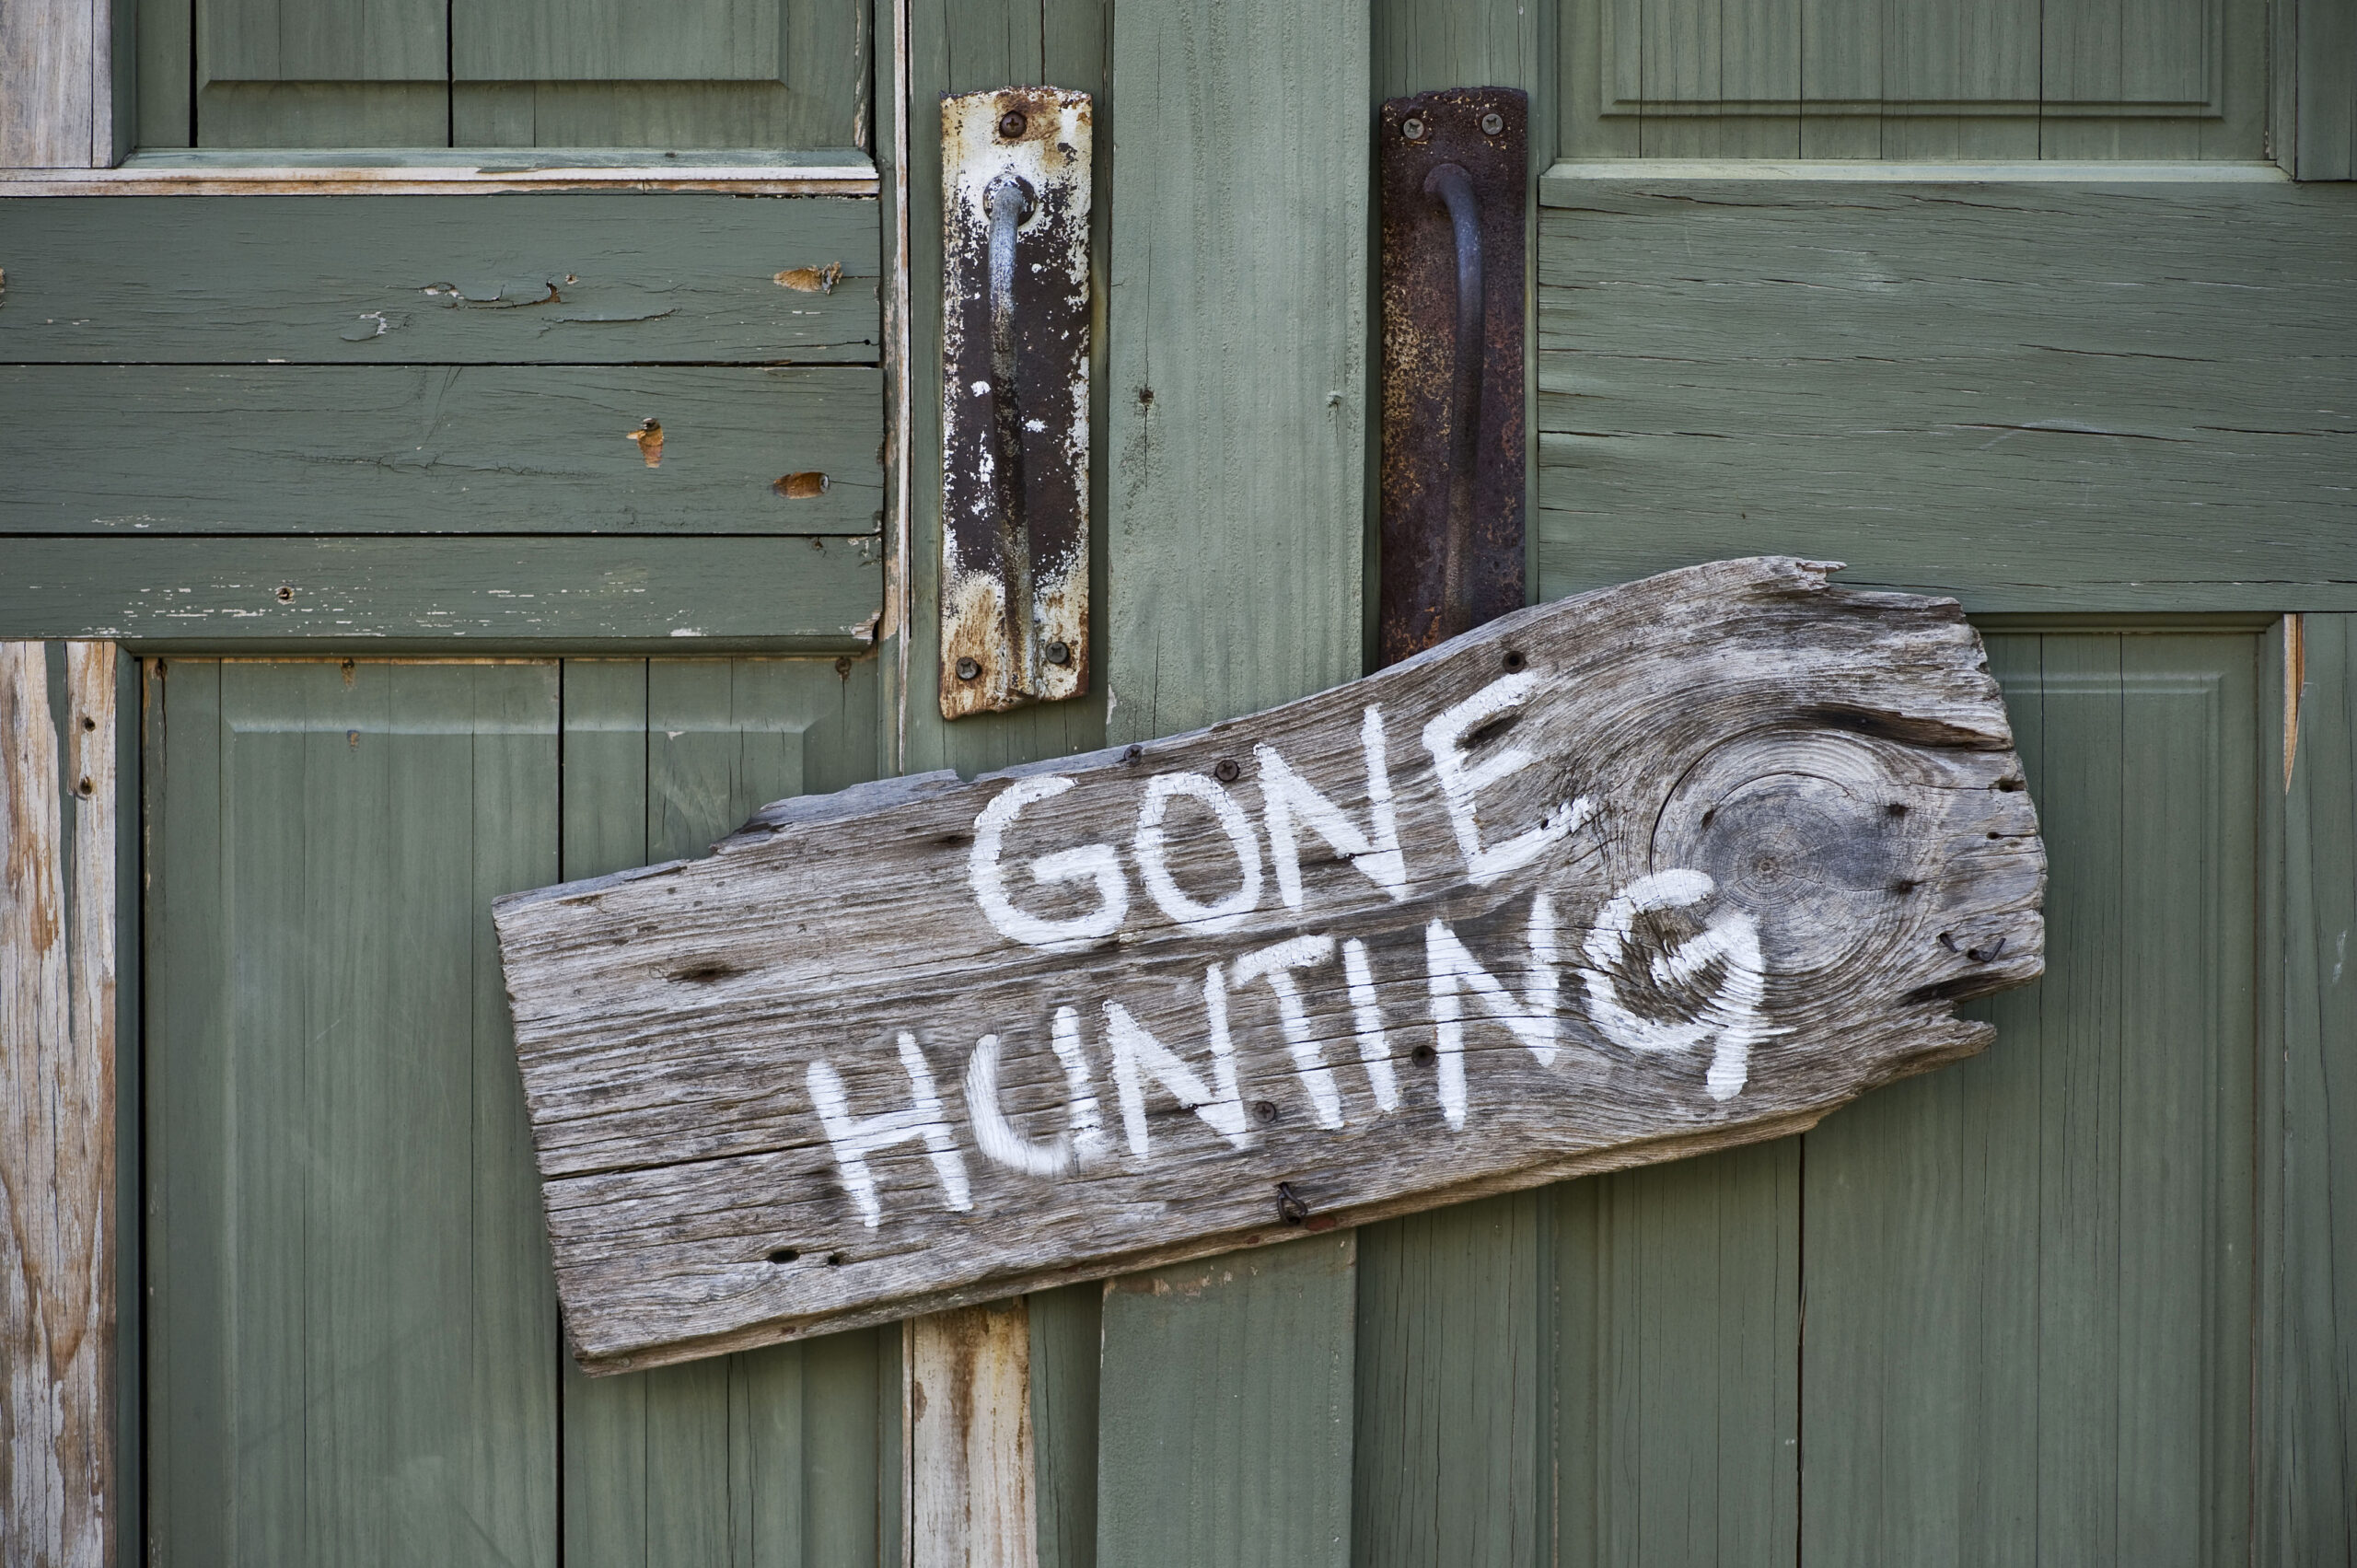 Gone Hunting.